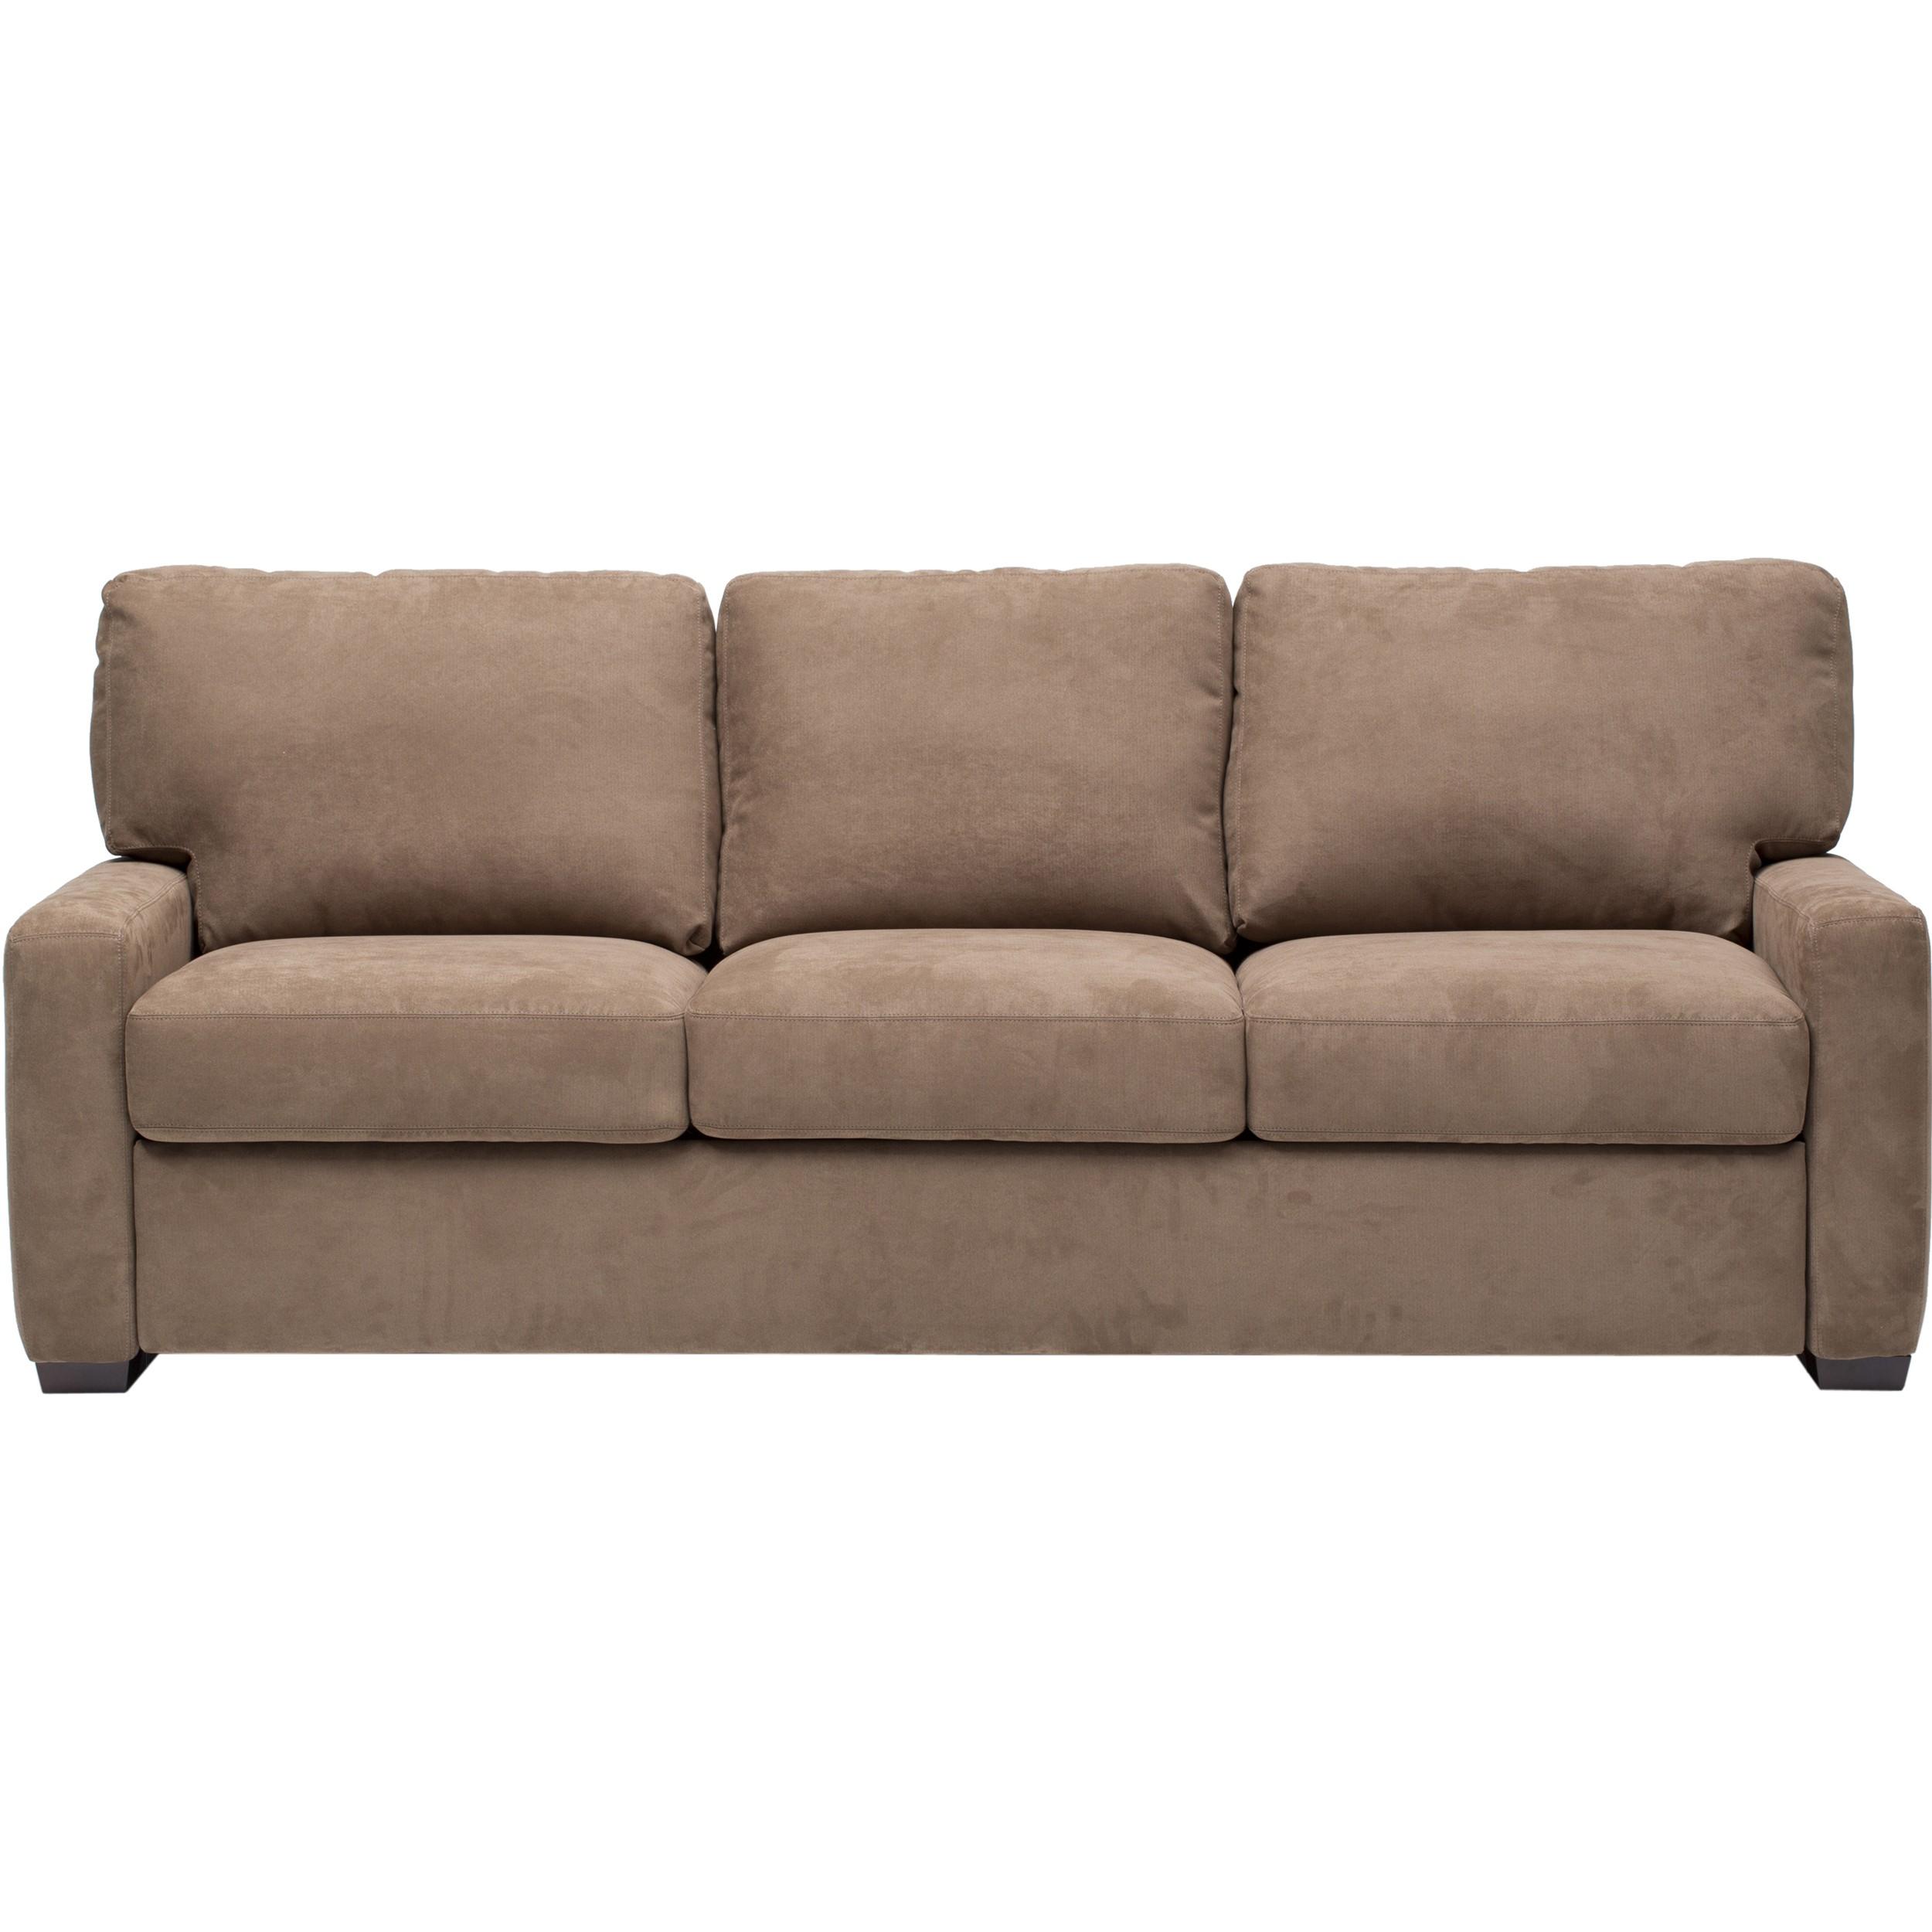 tempurpedic sleeper sofas bobkona poundex simplistic collection 3 piece sectional sofa with ottoman charcoal homesfeed